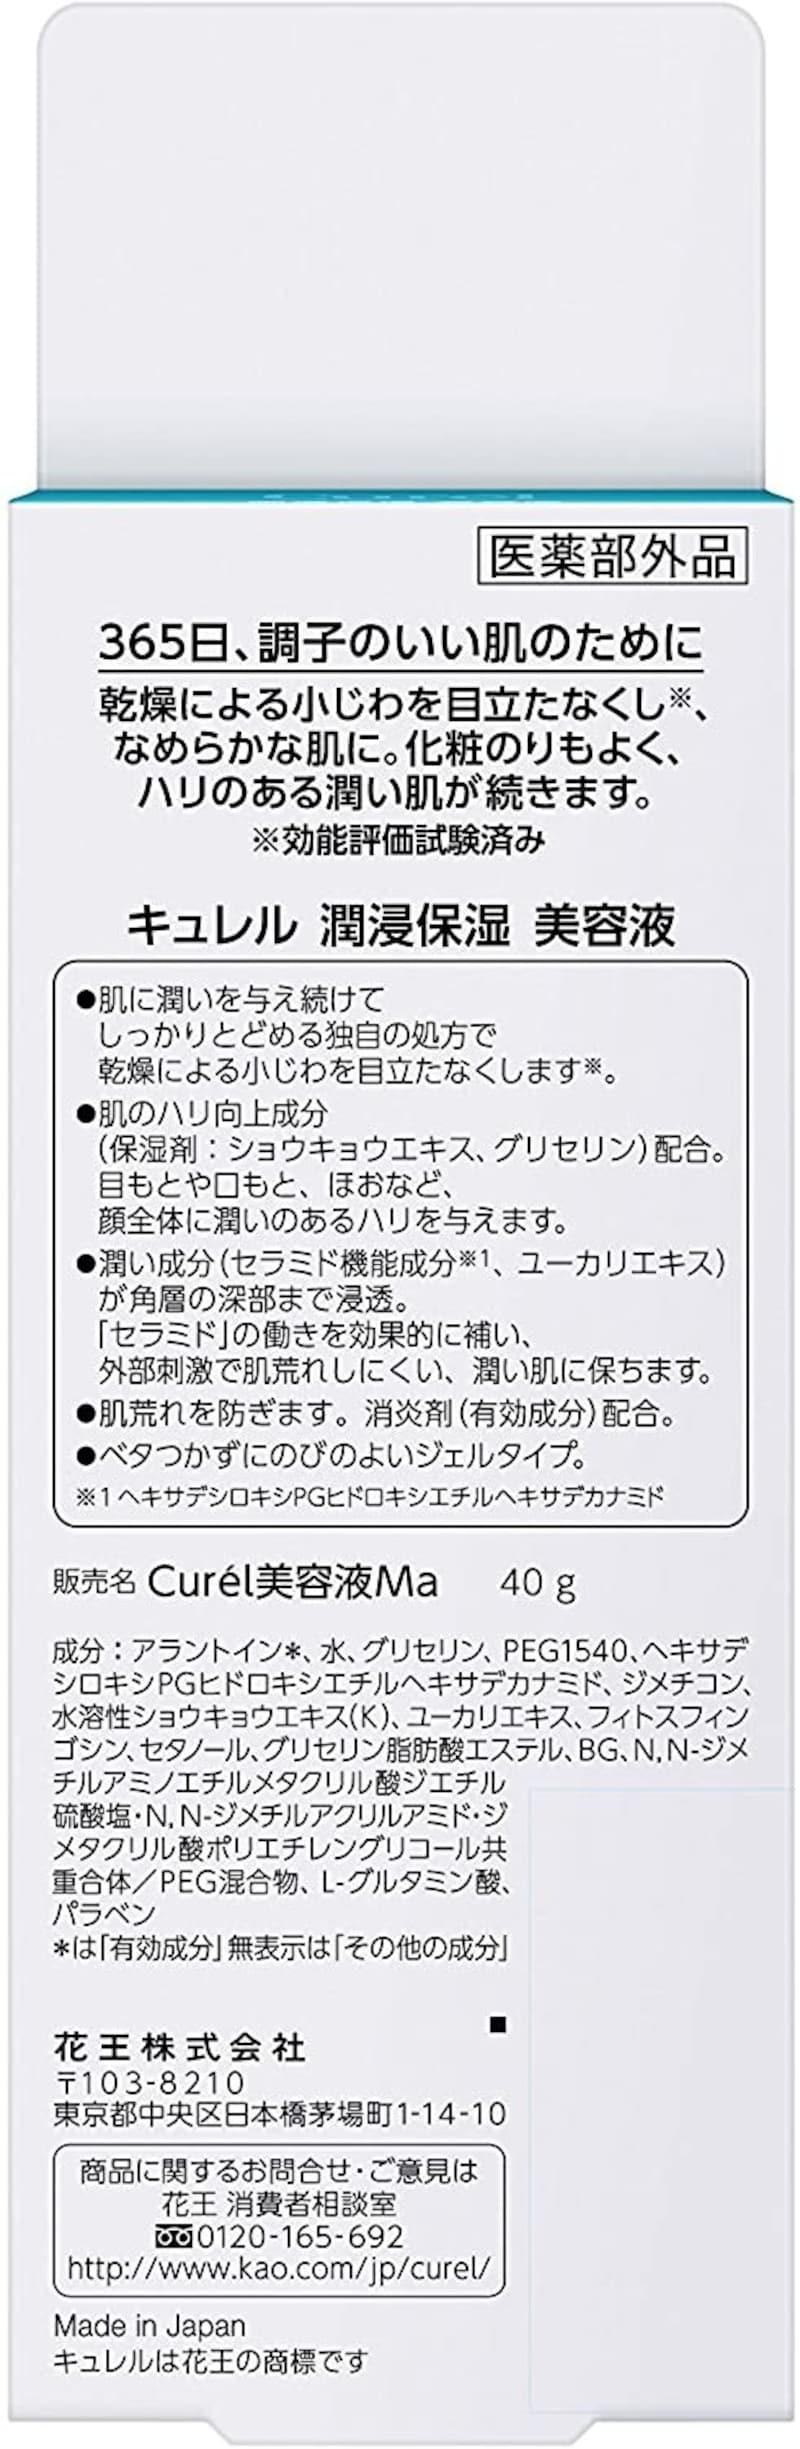 Kao(花王),Curel(キュレル) 潤浸保湿美容液